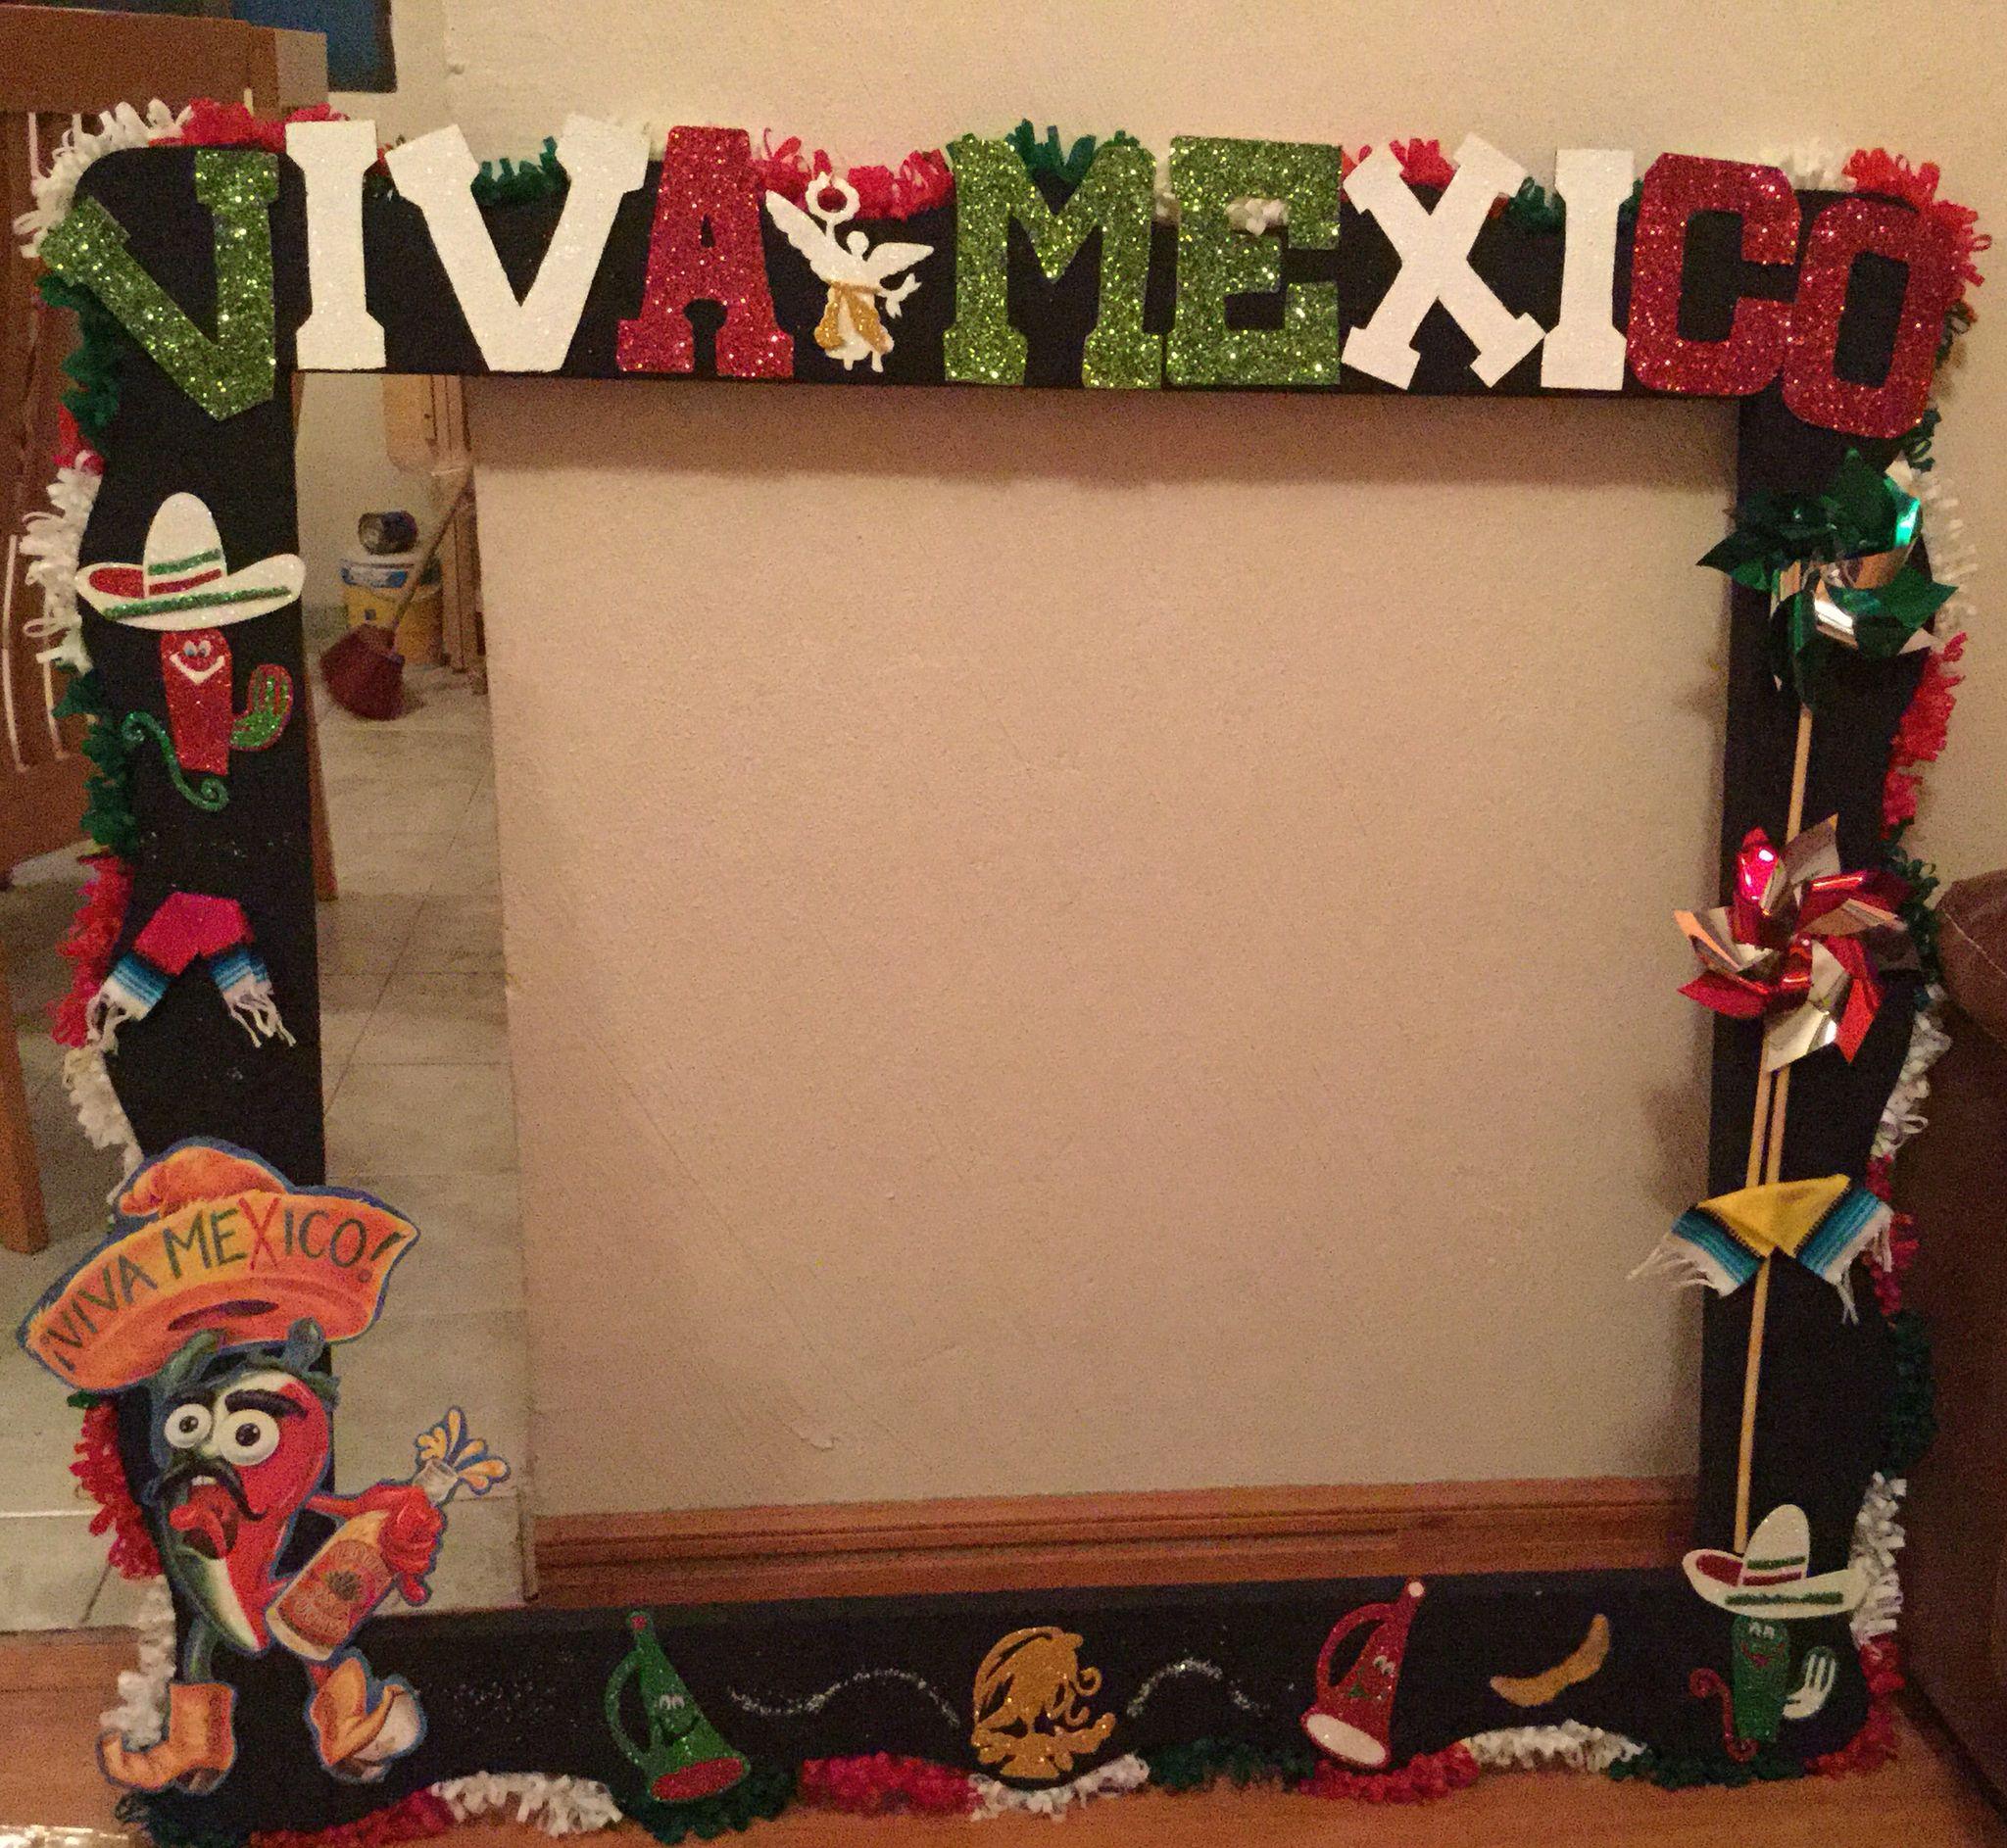 Cuadros Para Fotos De Fiesta Mexicana